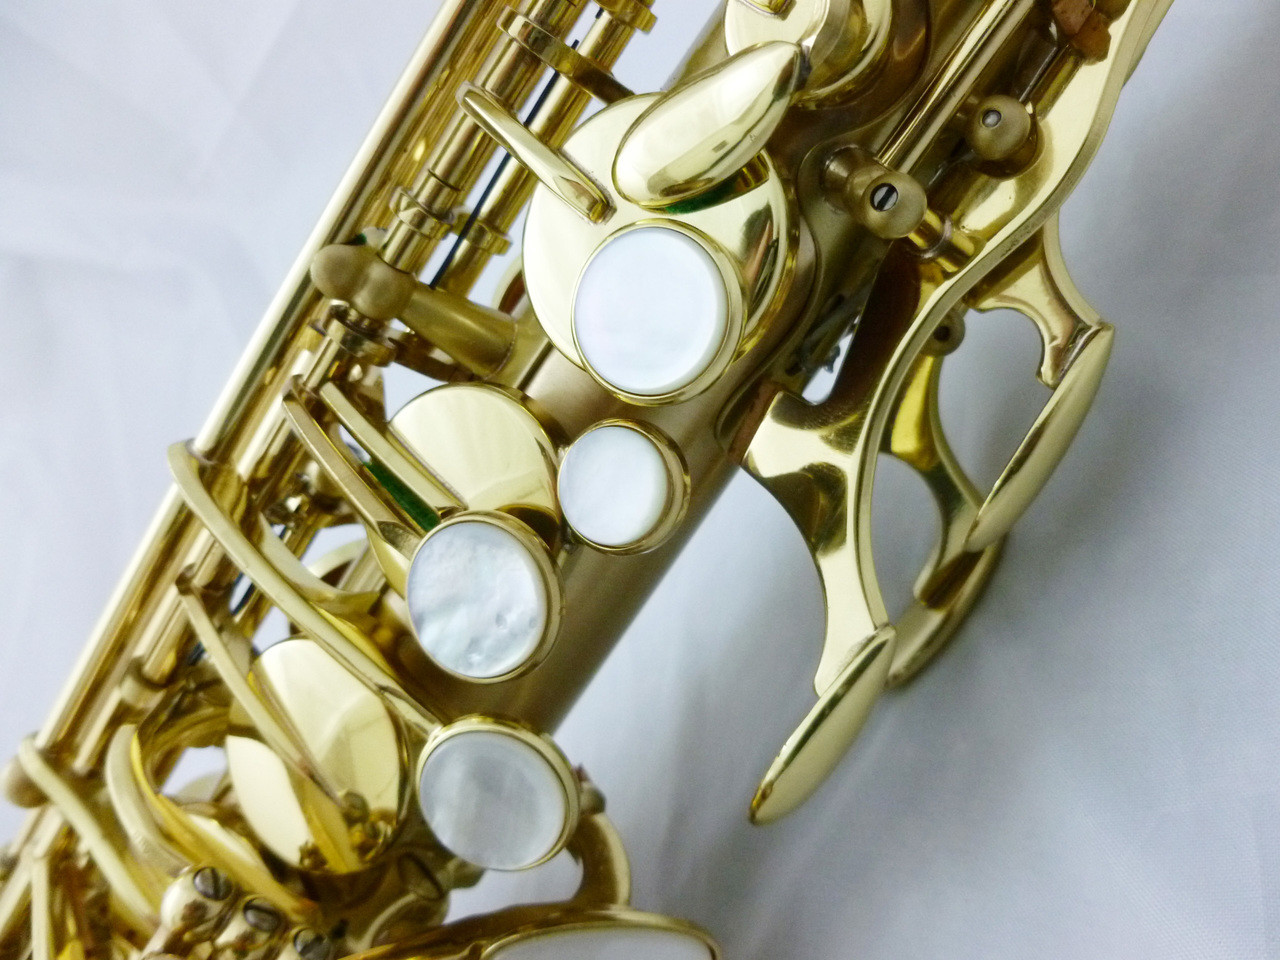 P Mauriat Le Bravo 200 Alto Saxophone 5